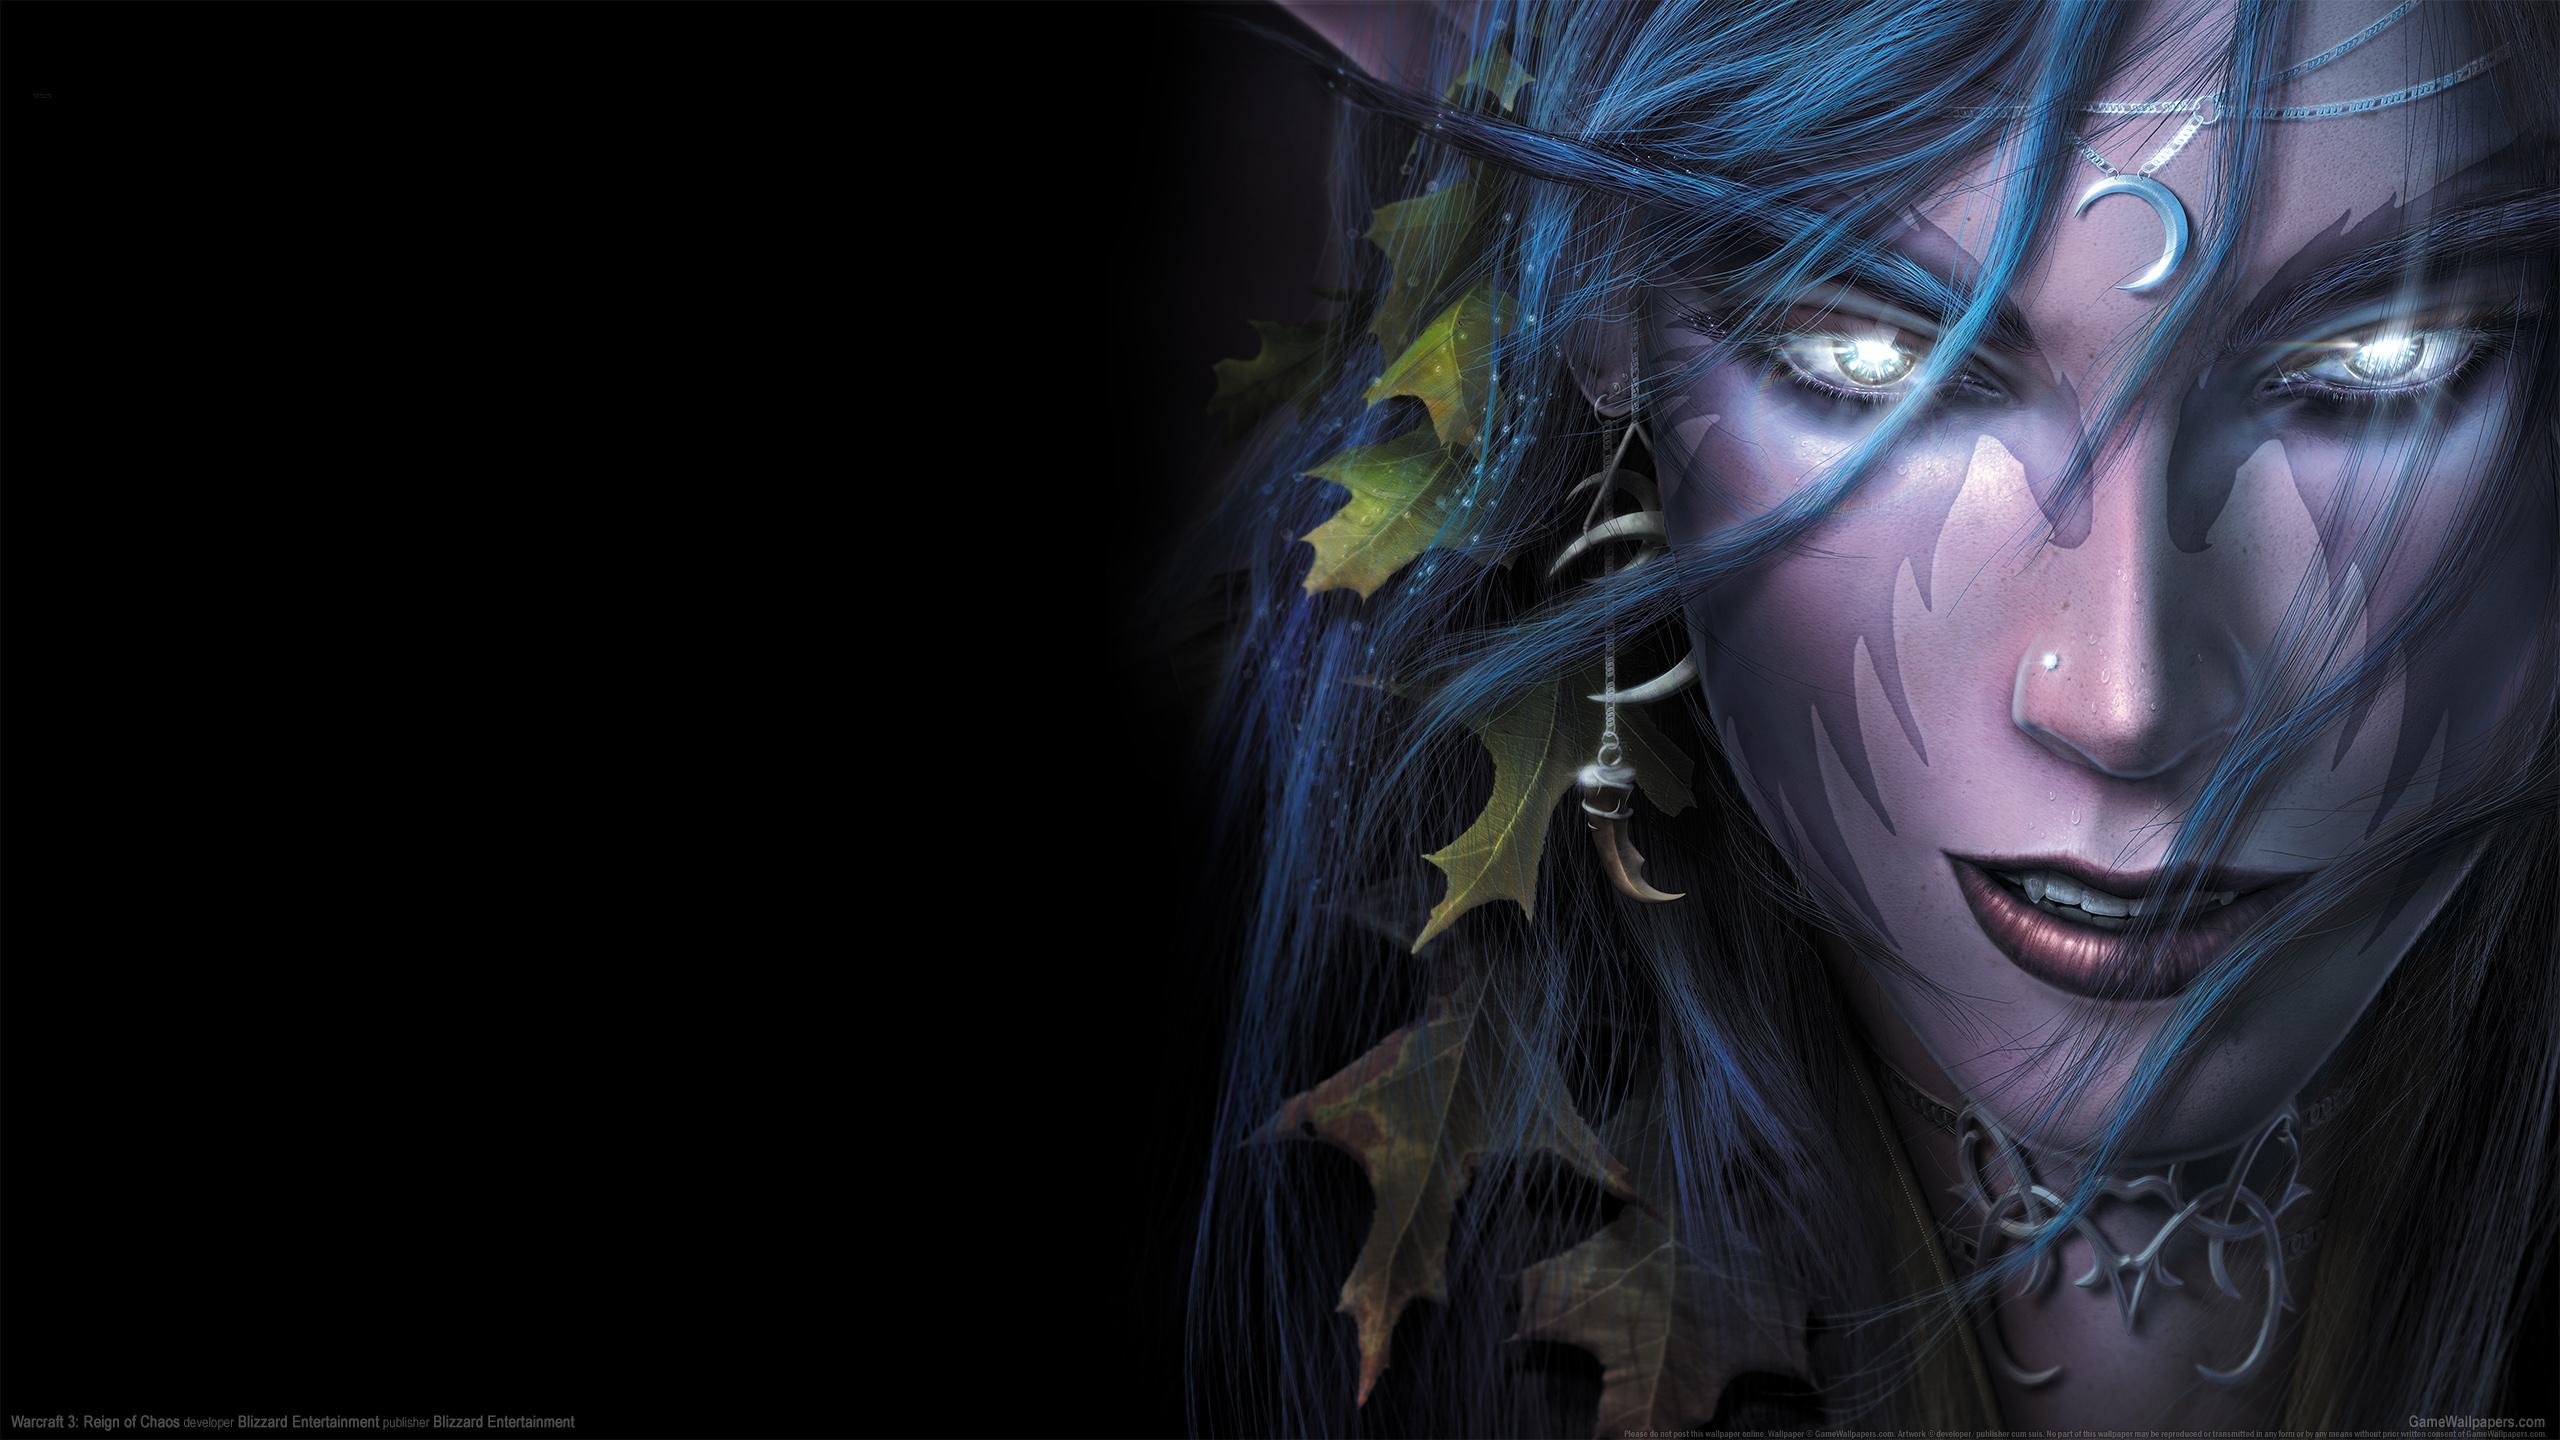 Warcraft 3: Reign of Chaos 2560x1440 Hintergrundbild 23